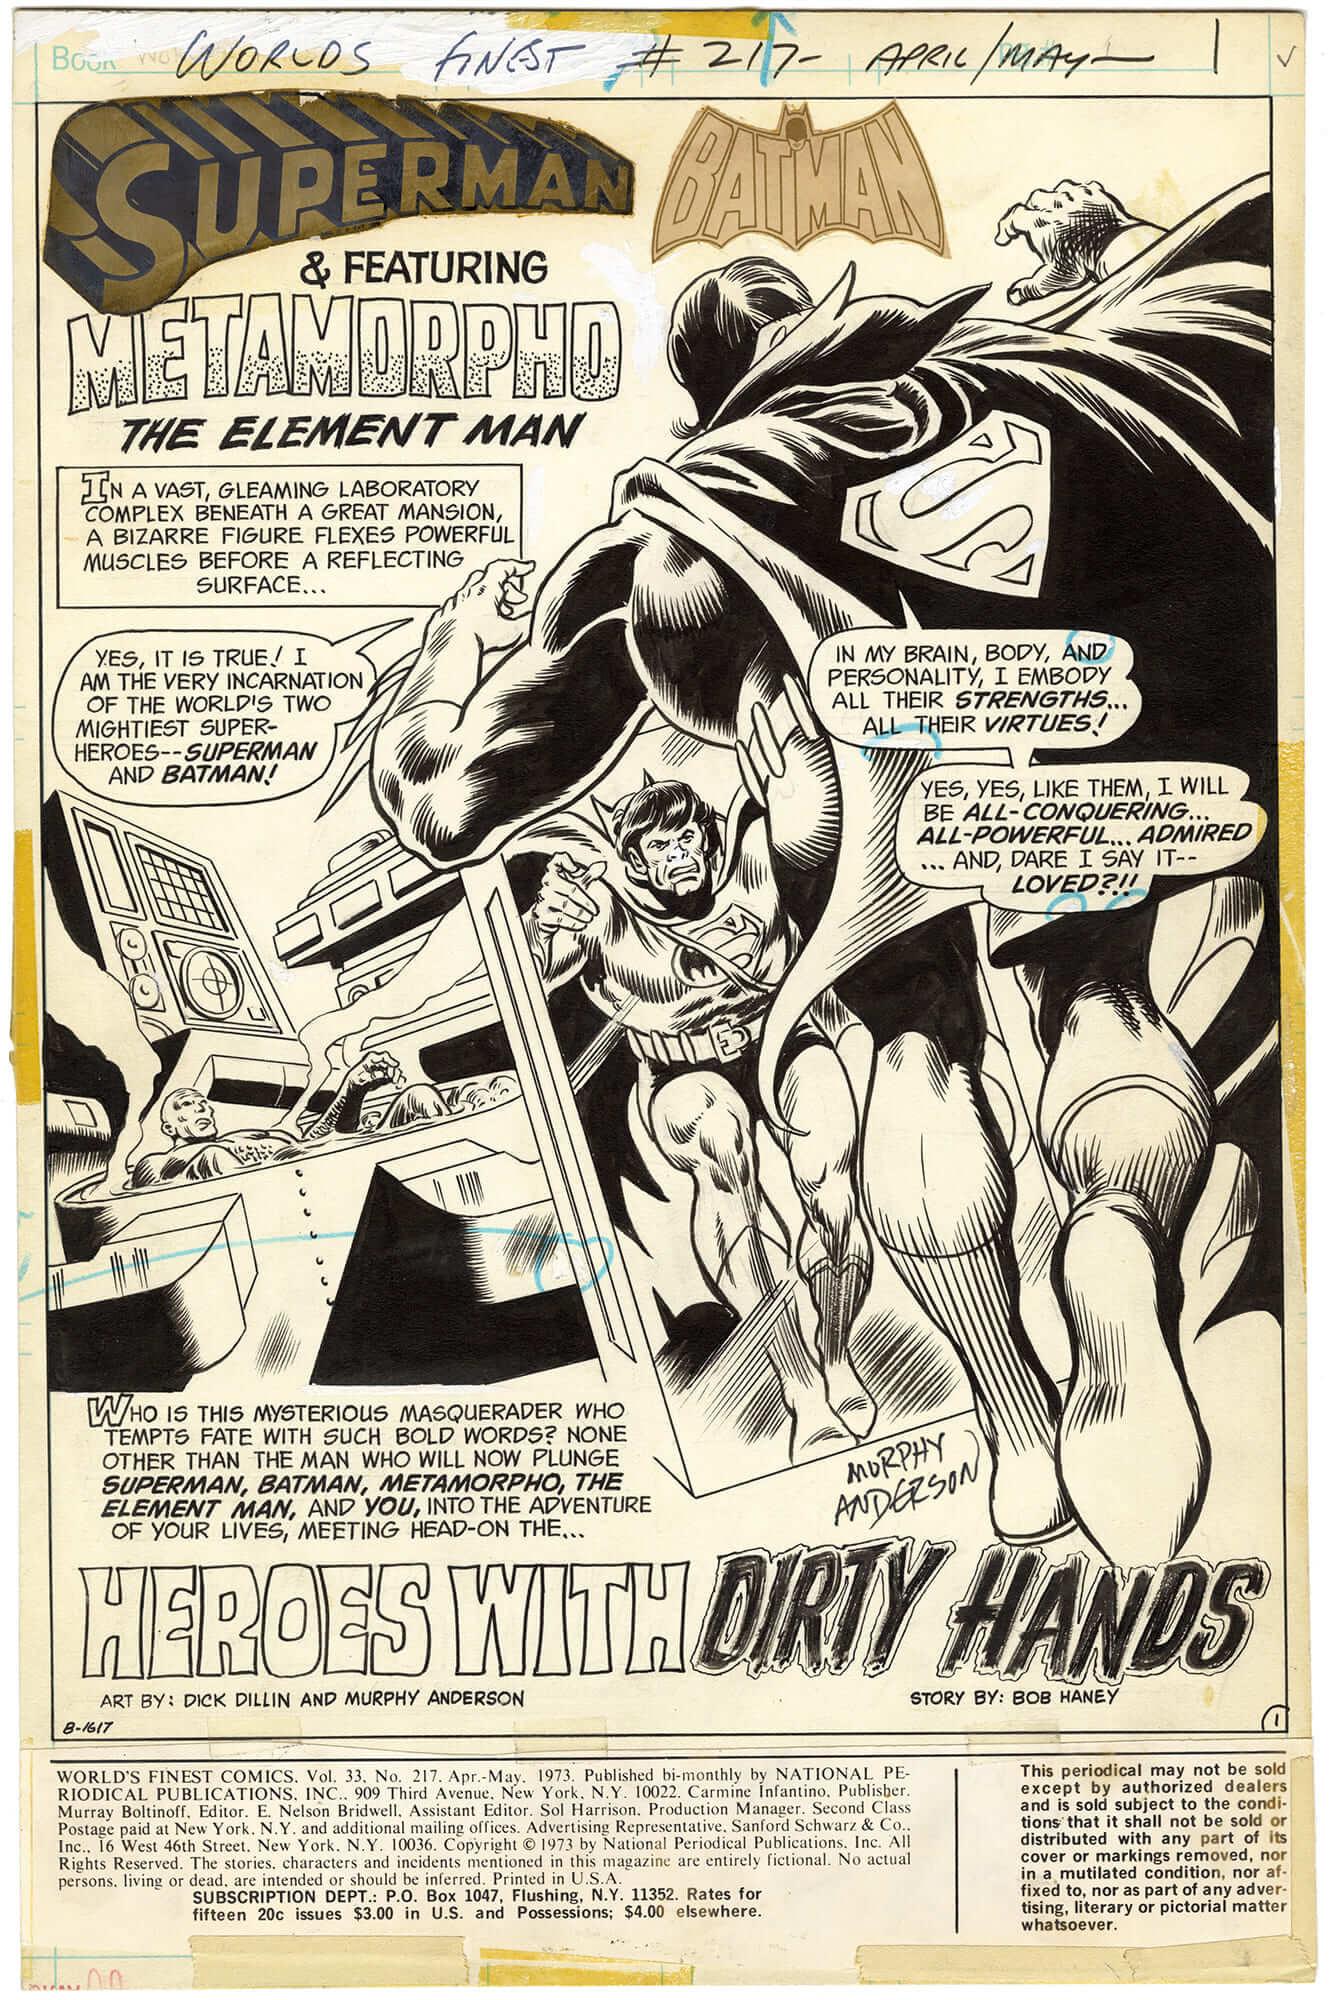 World's Finest Comics #217 p1 (Signed)